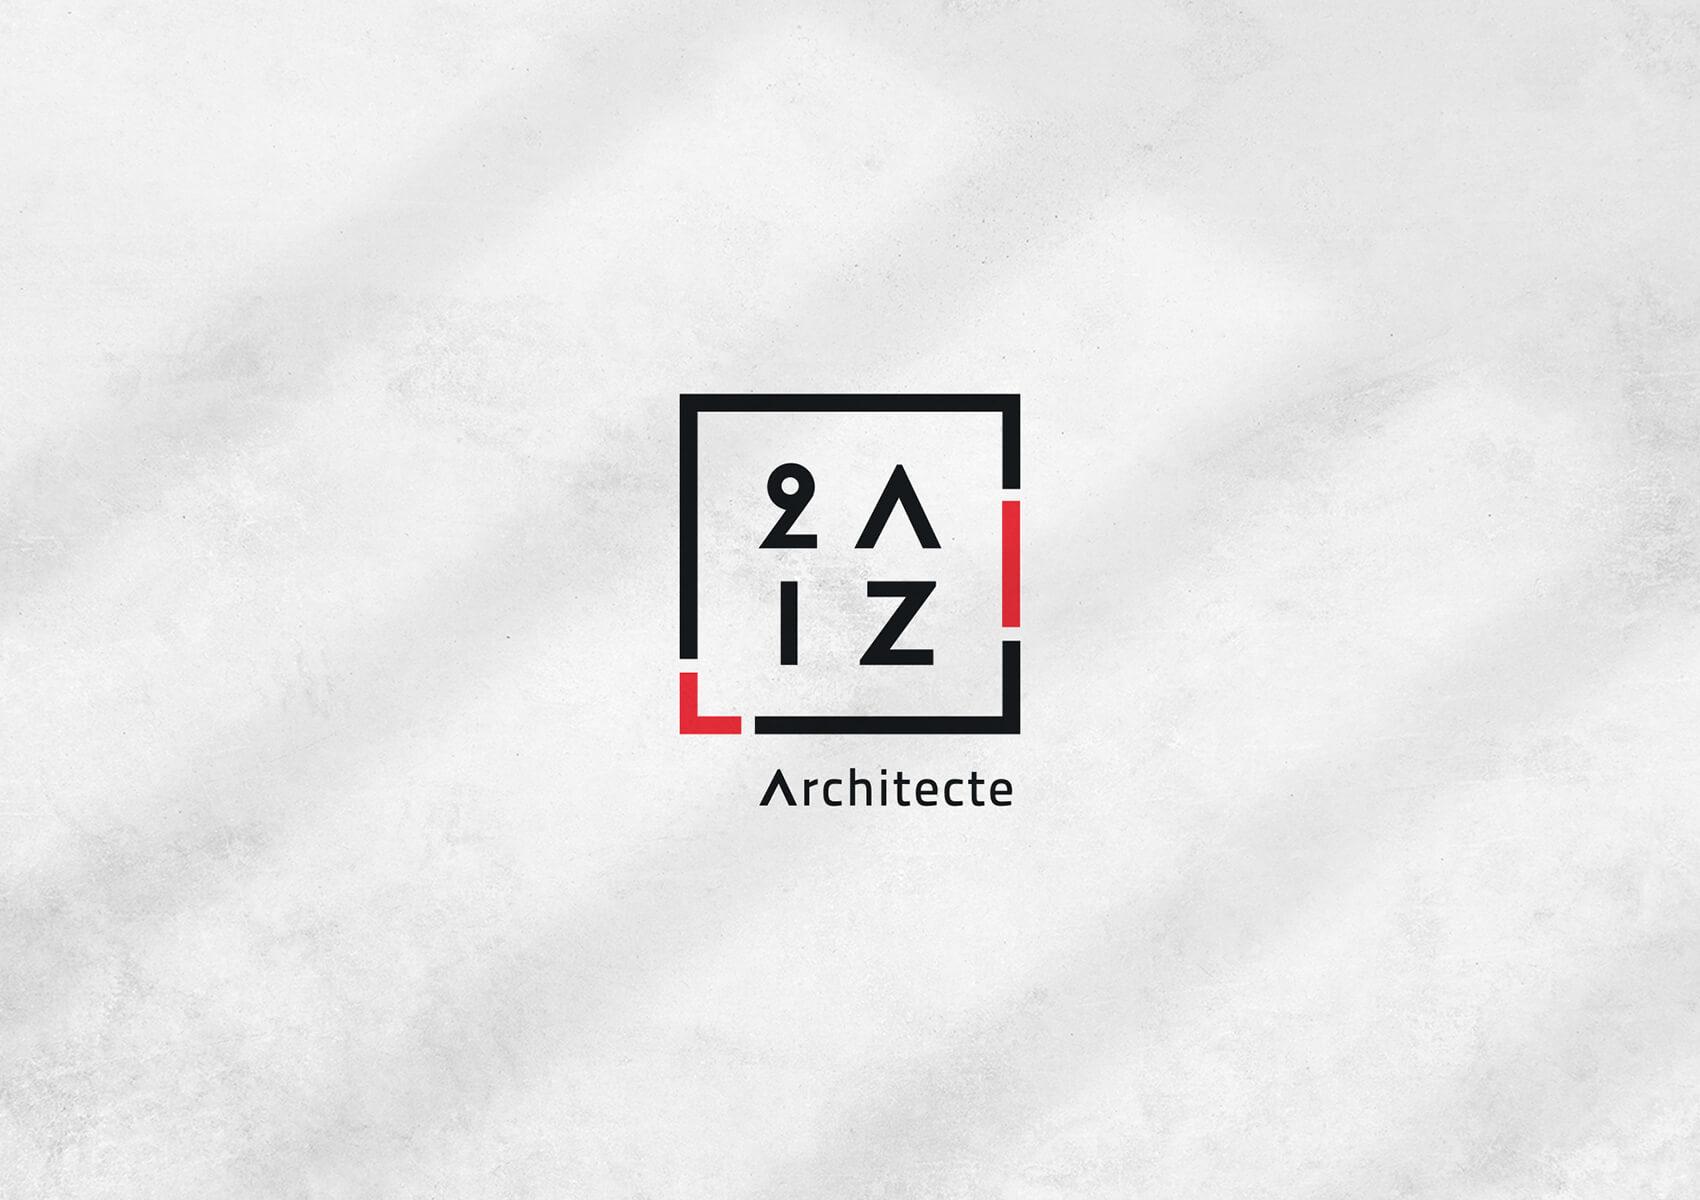 2aiz_logo